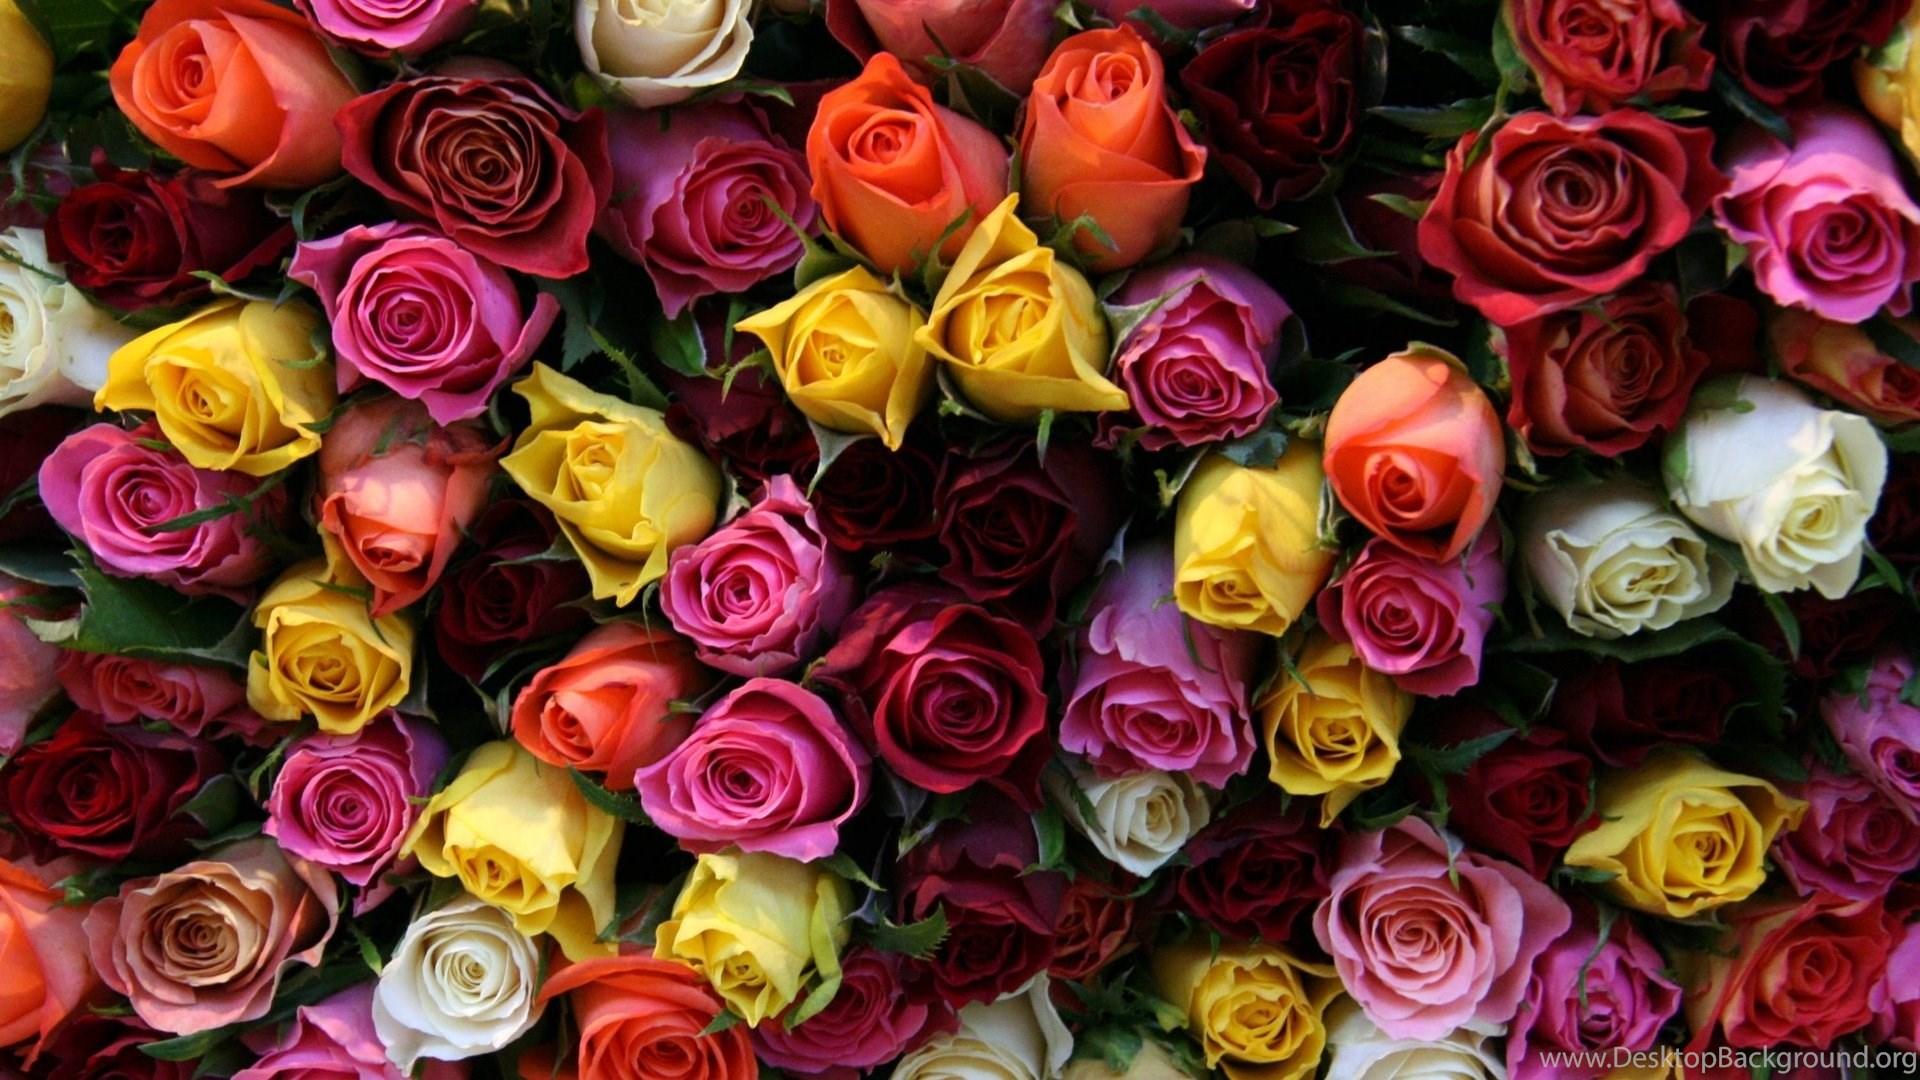 Beautiful Flower Bouquet Love Flowers Roses Full Screen Image